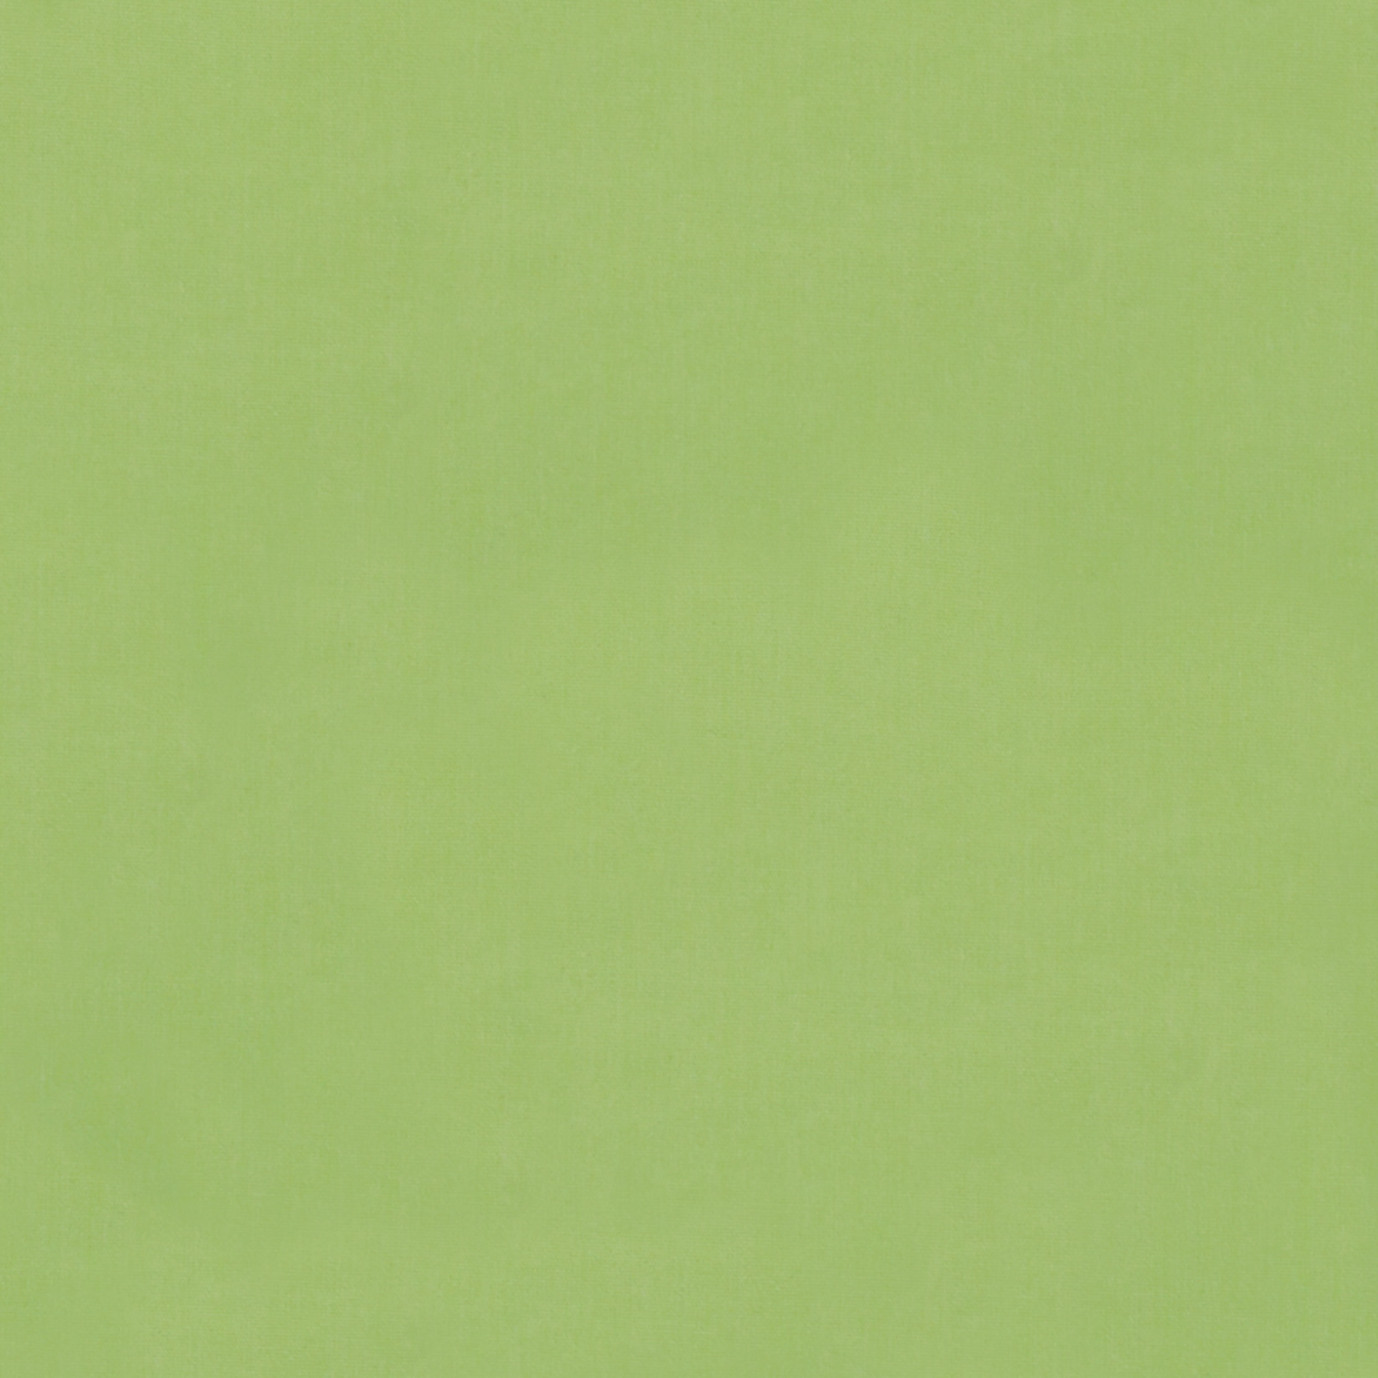 Deco™ 9 Piece Dining Set - Ginkgo Green